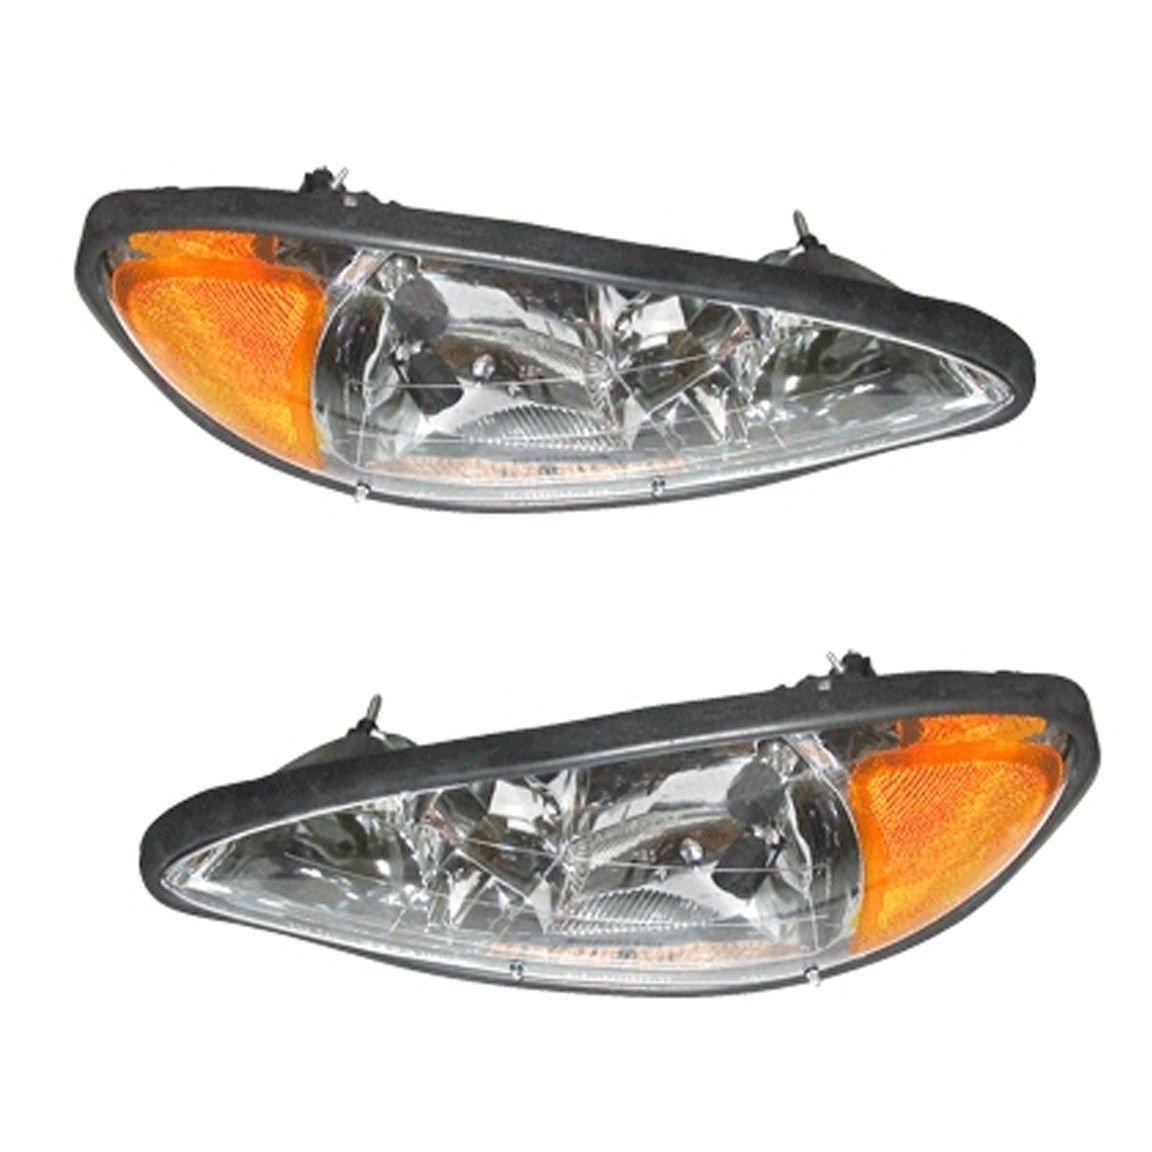 Pontiac Grand Am 1999-2005 99 00 01 02 03 04 05 Head Light Headlight Pair Set Auto Parts Avenue 1109180